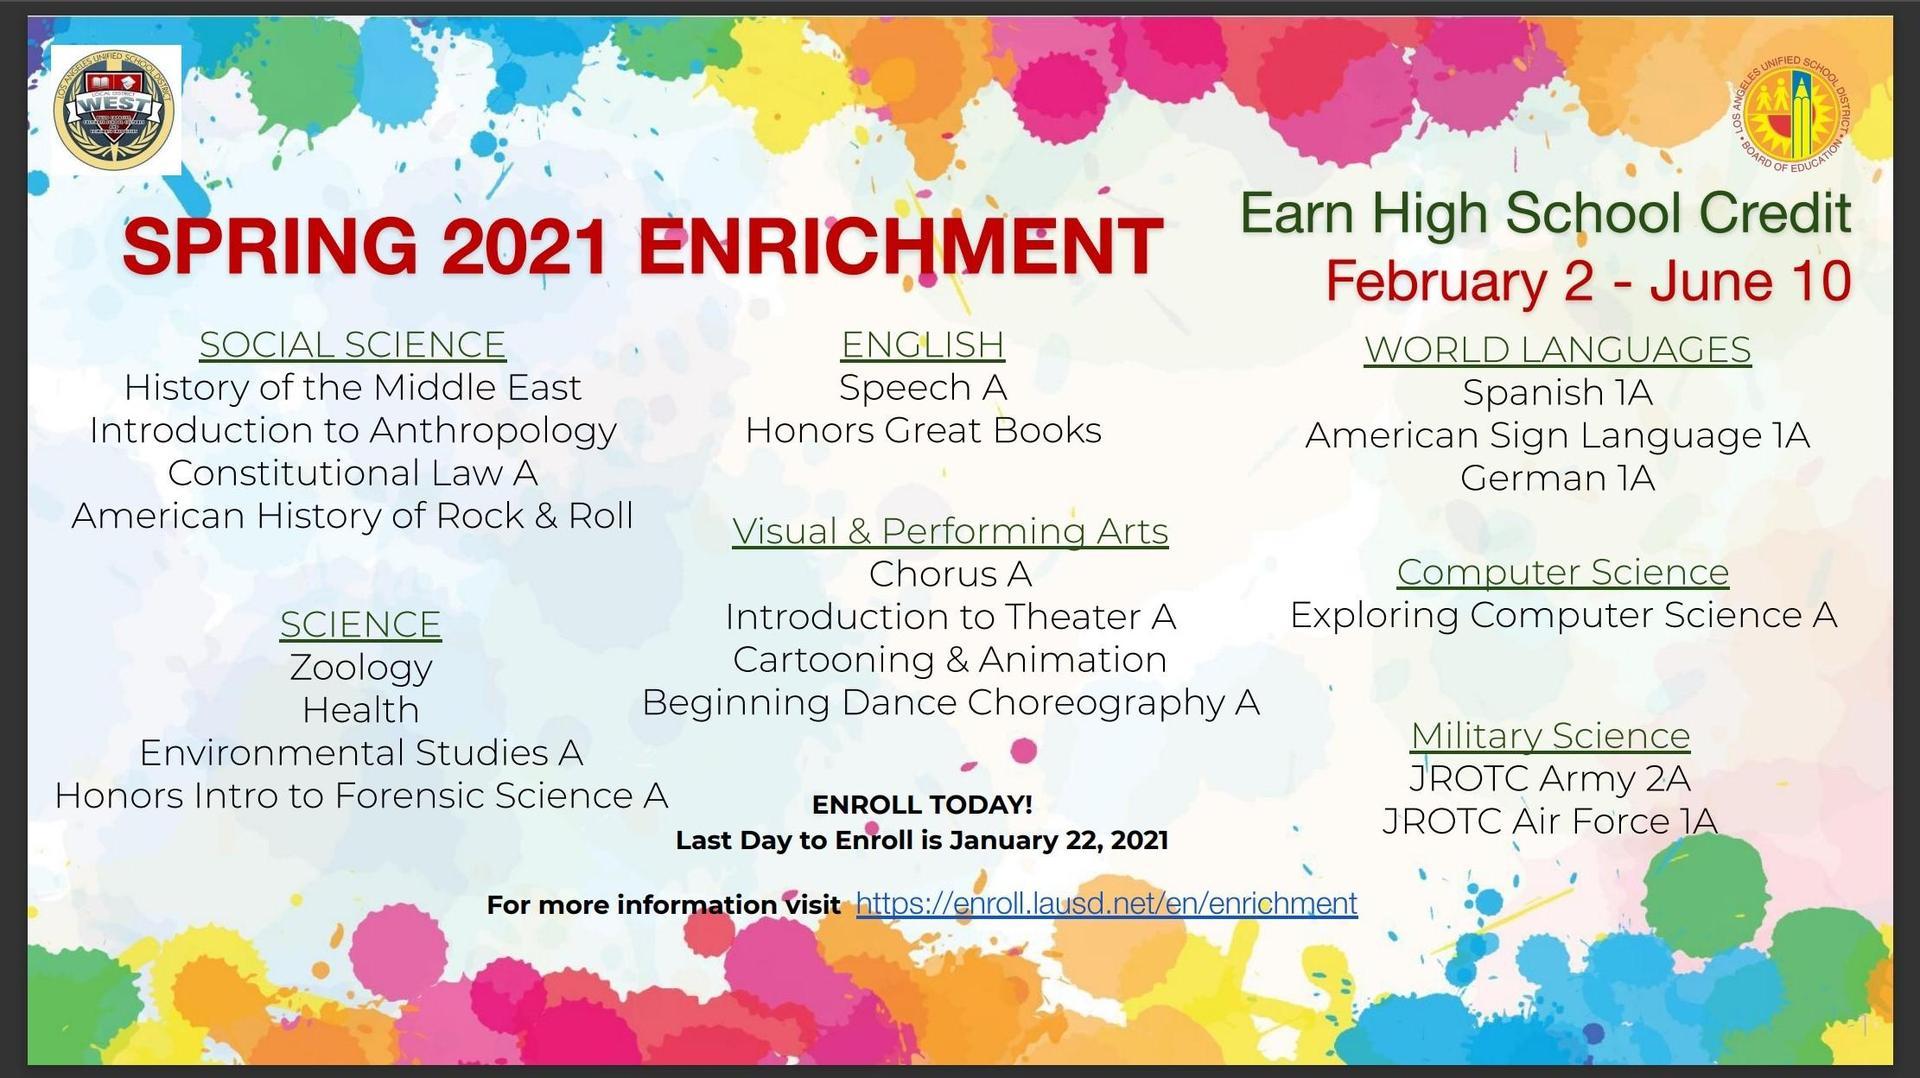 Spring 2021 Enrichment Courses